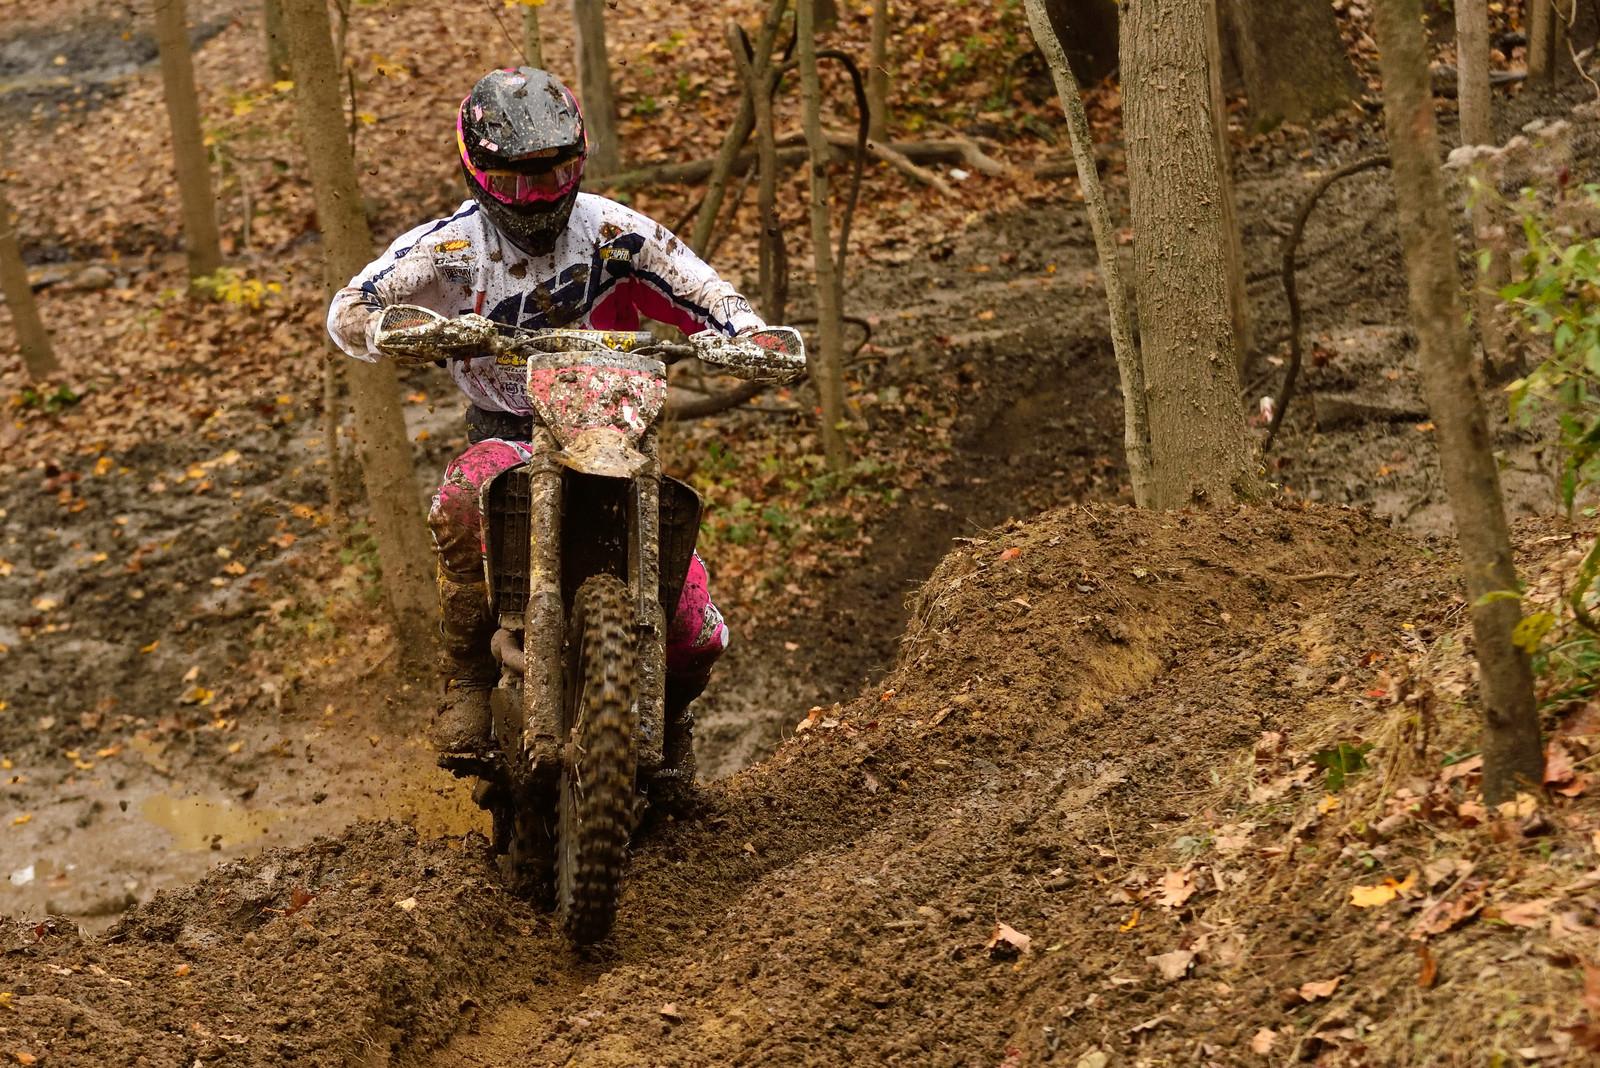 Layne Michael - Ironman GNCC - Motocross Pictures - Vital MX